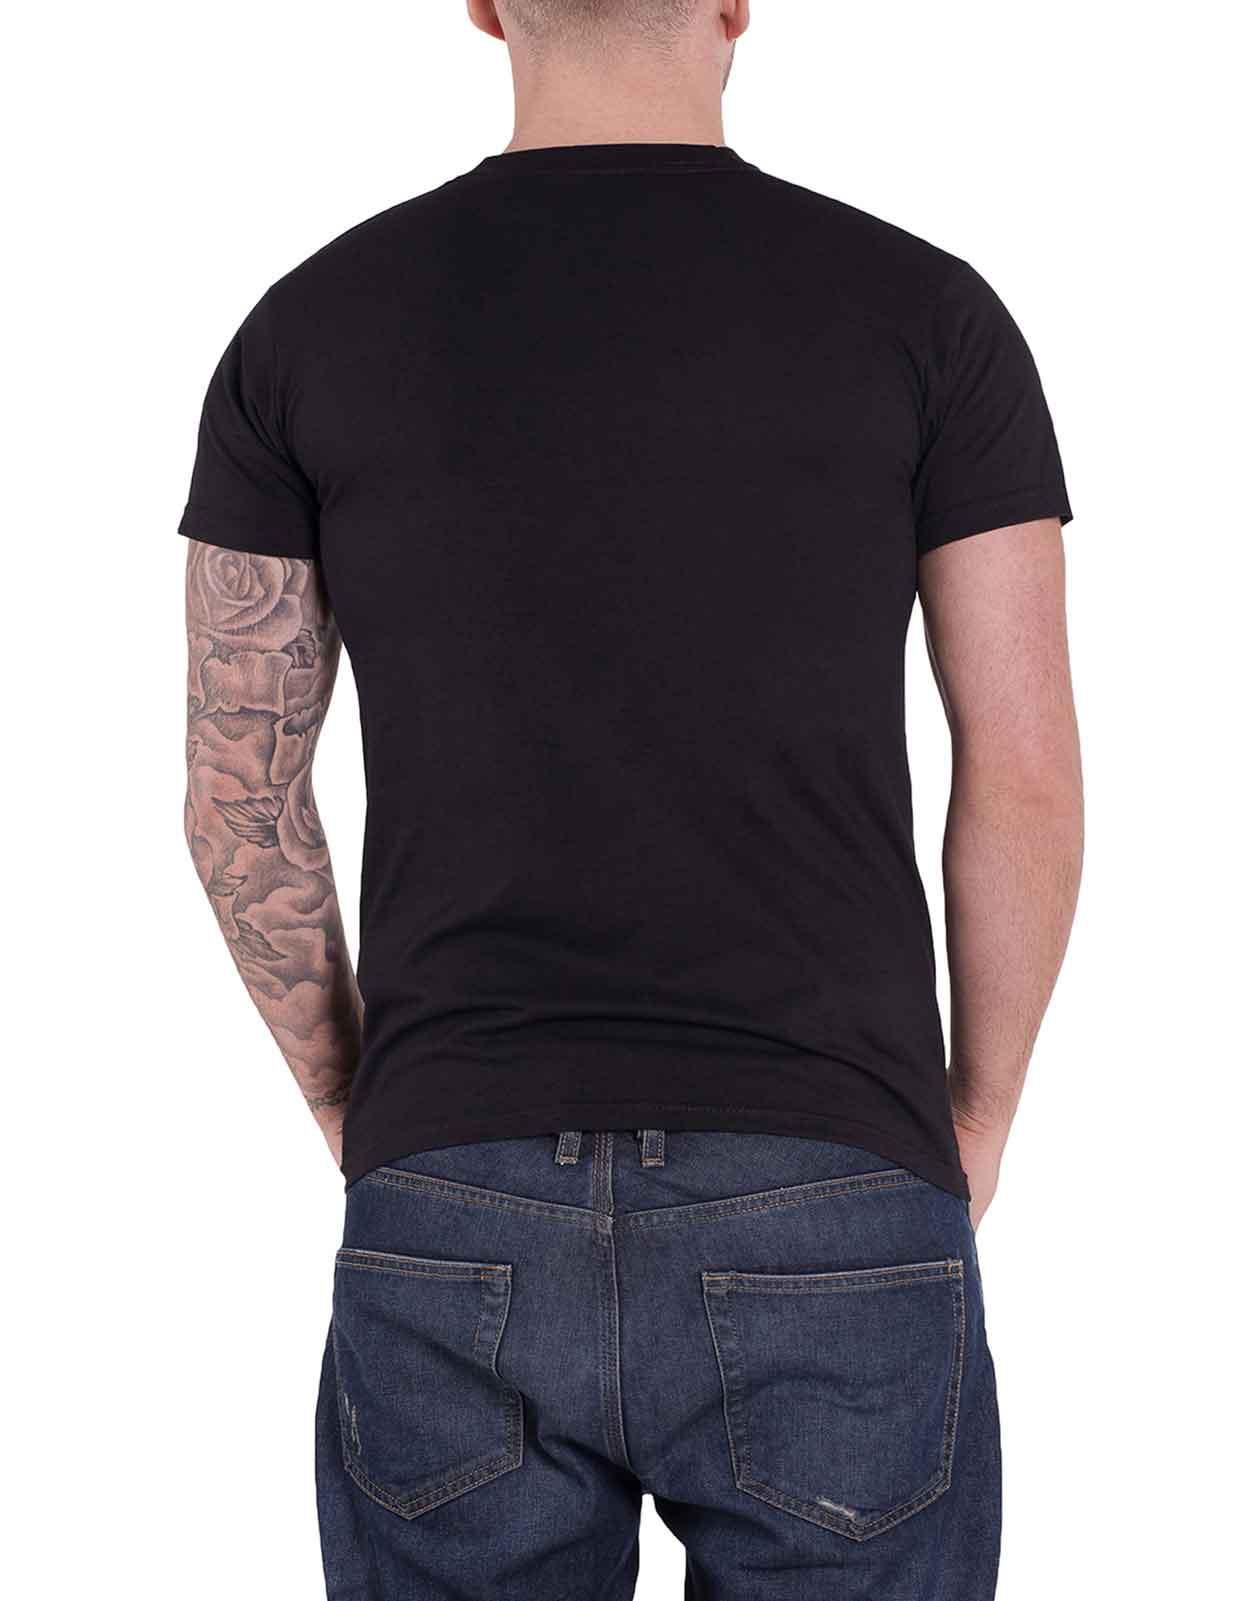 Official-Motley-Crue-T-Shirt-Shout-at-the-Devil-The-Dirt-Tour-Band-Logo-Mens thumbnail 31